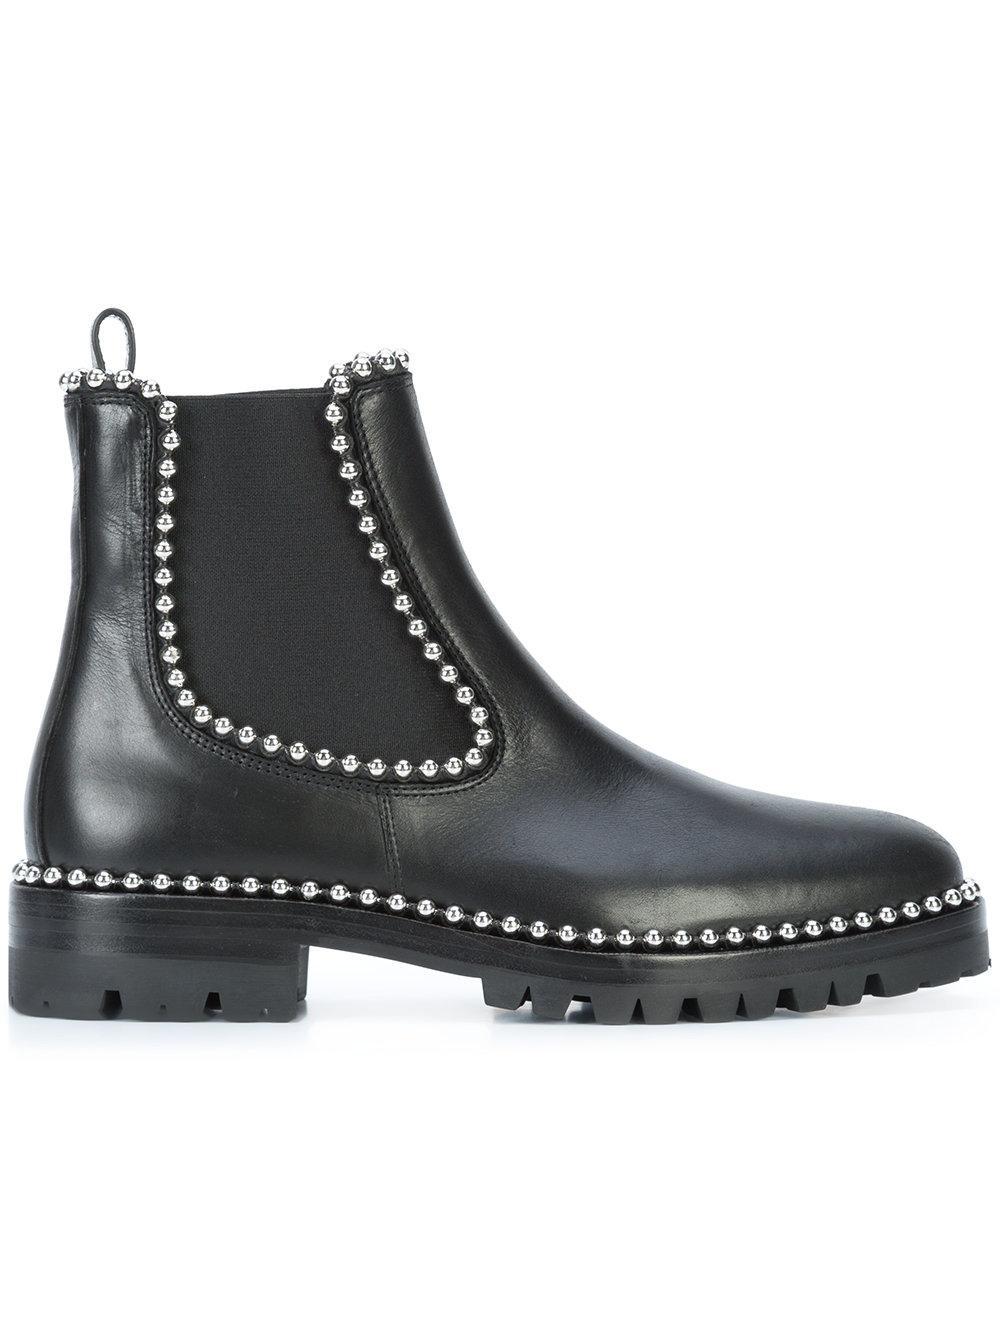 alexander wang spencer chelsea boots in black lyst. Black Bedroom Furniture Sets. Home Design Ideas